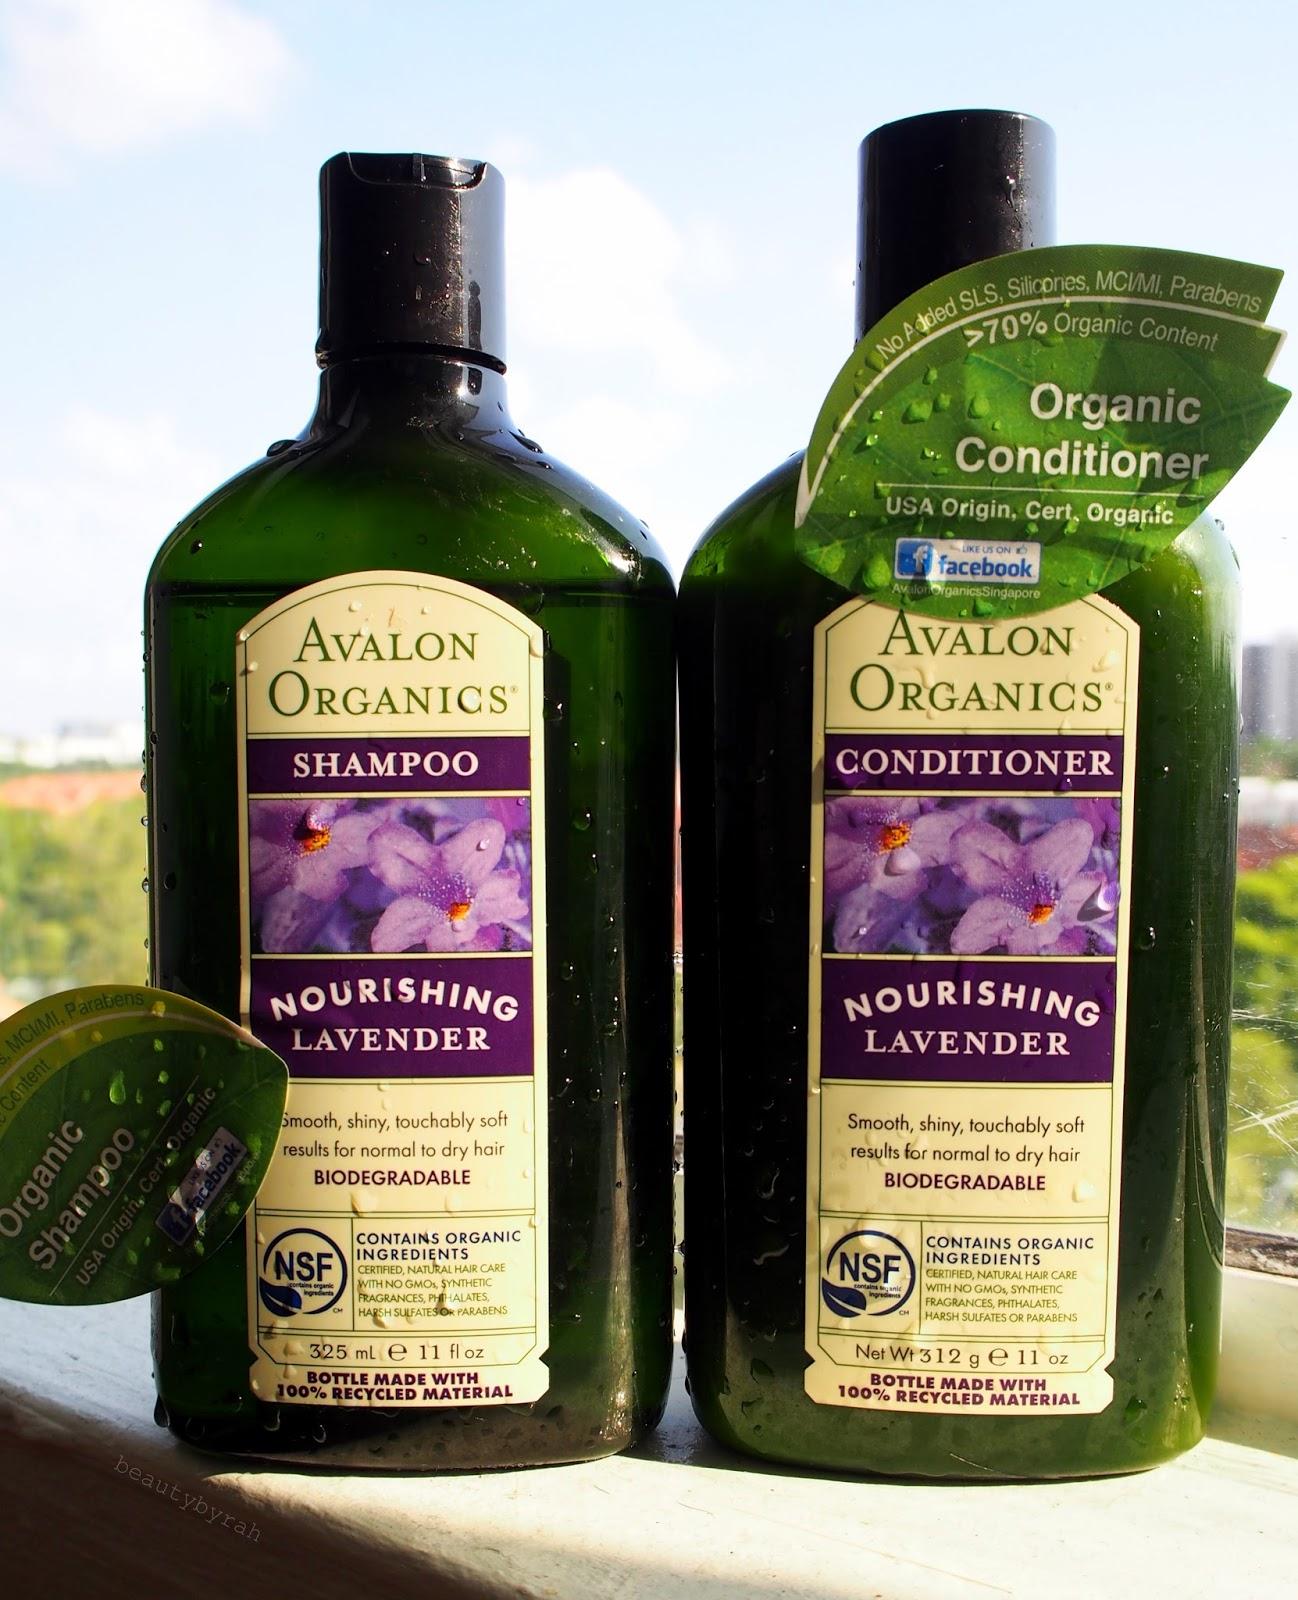 Avalon Organics Lavender Shampoo and Conditioner Review